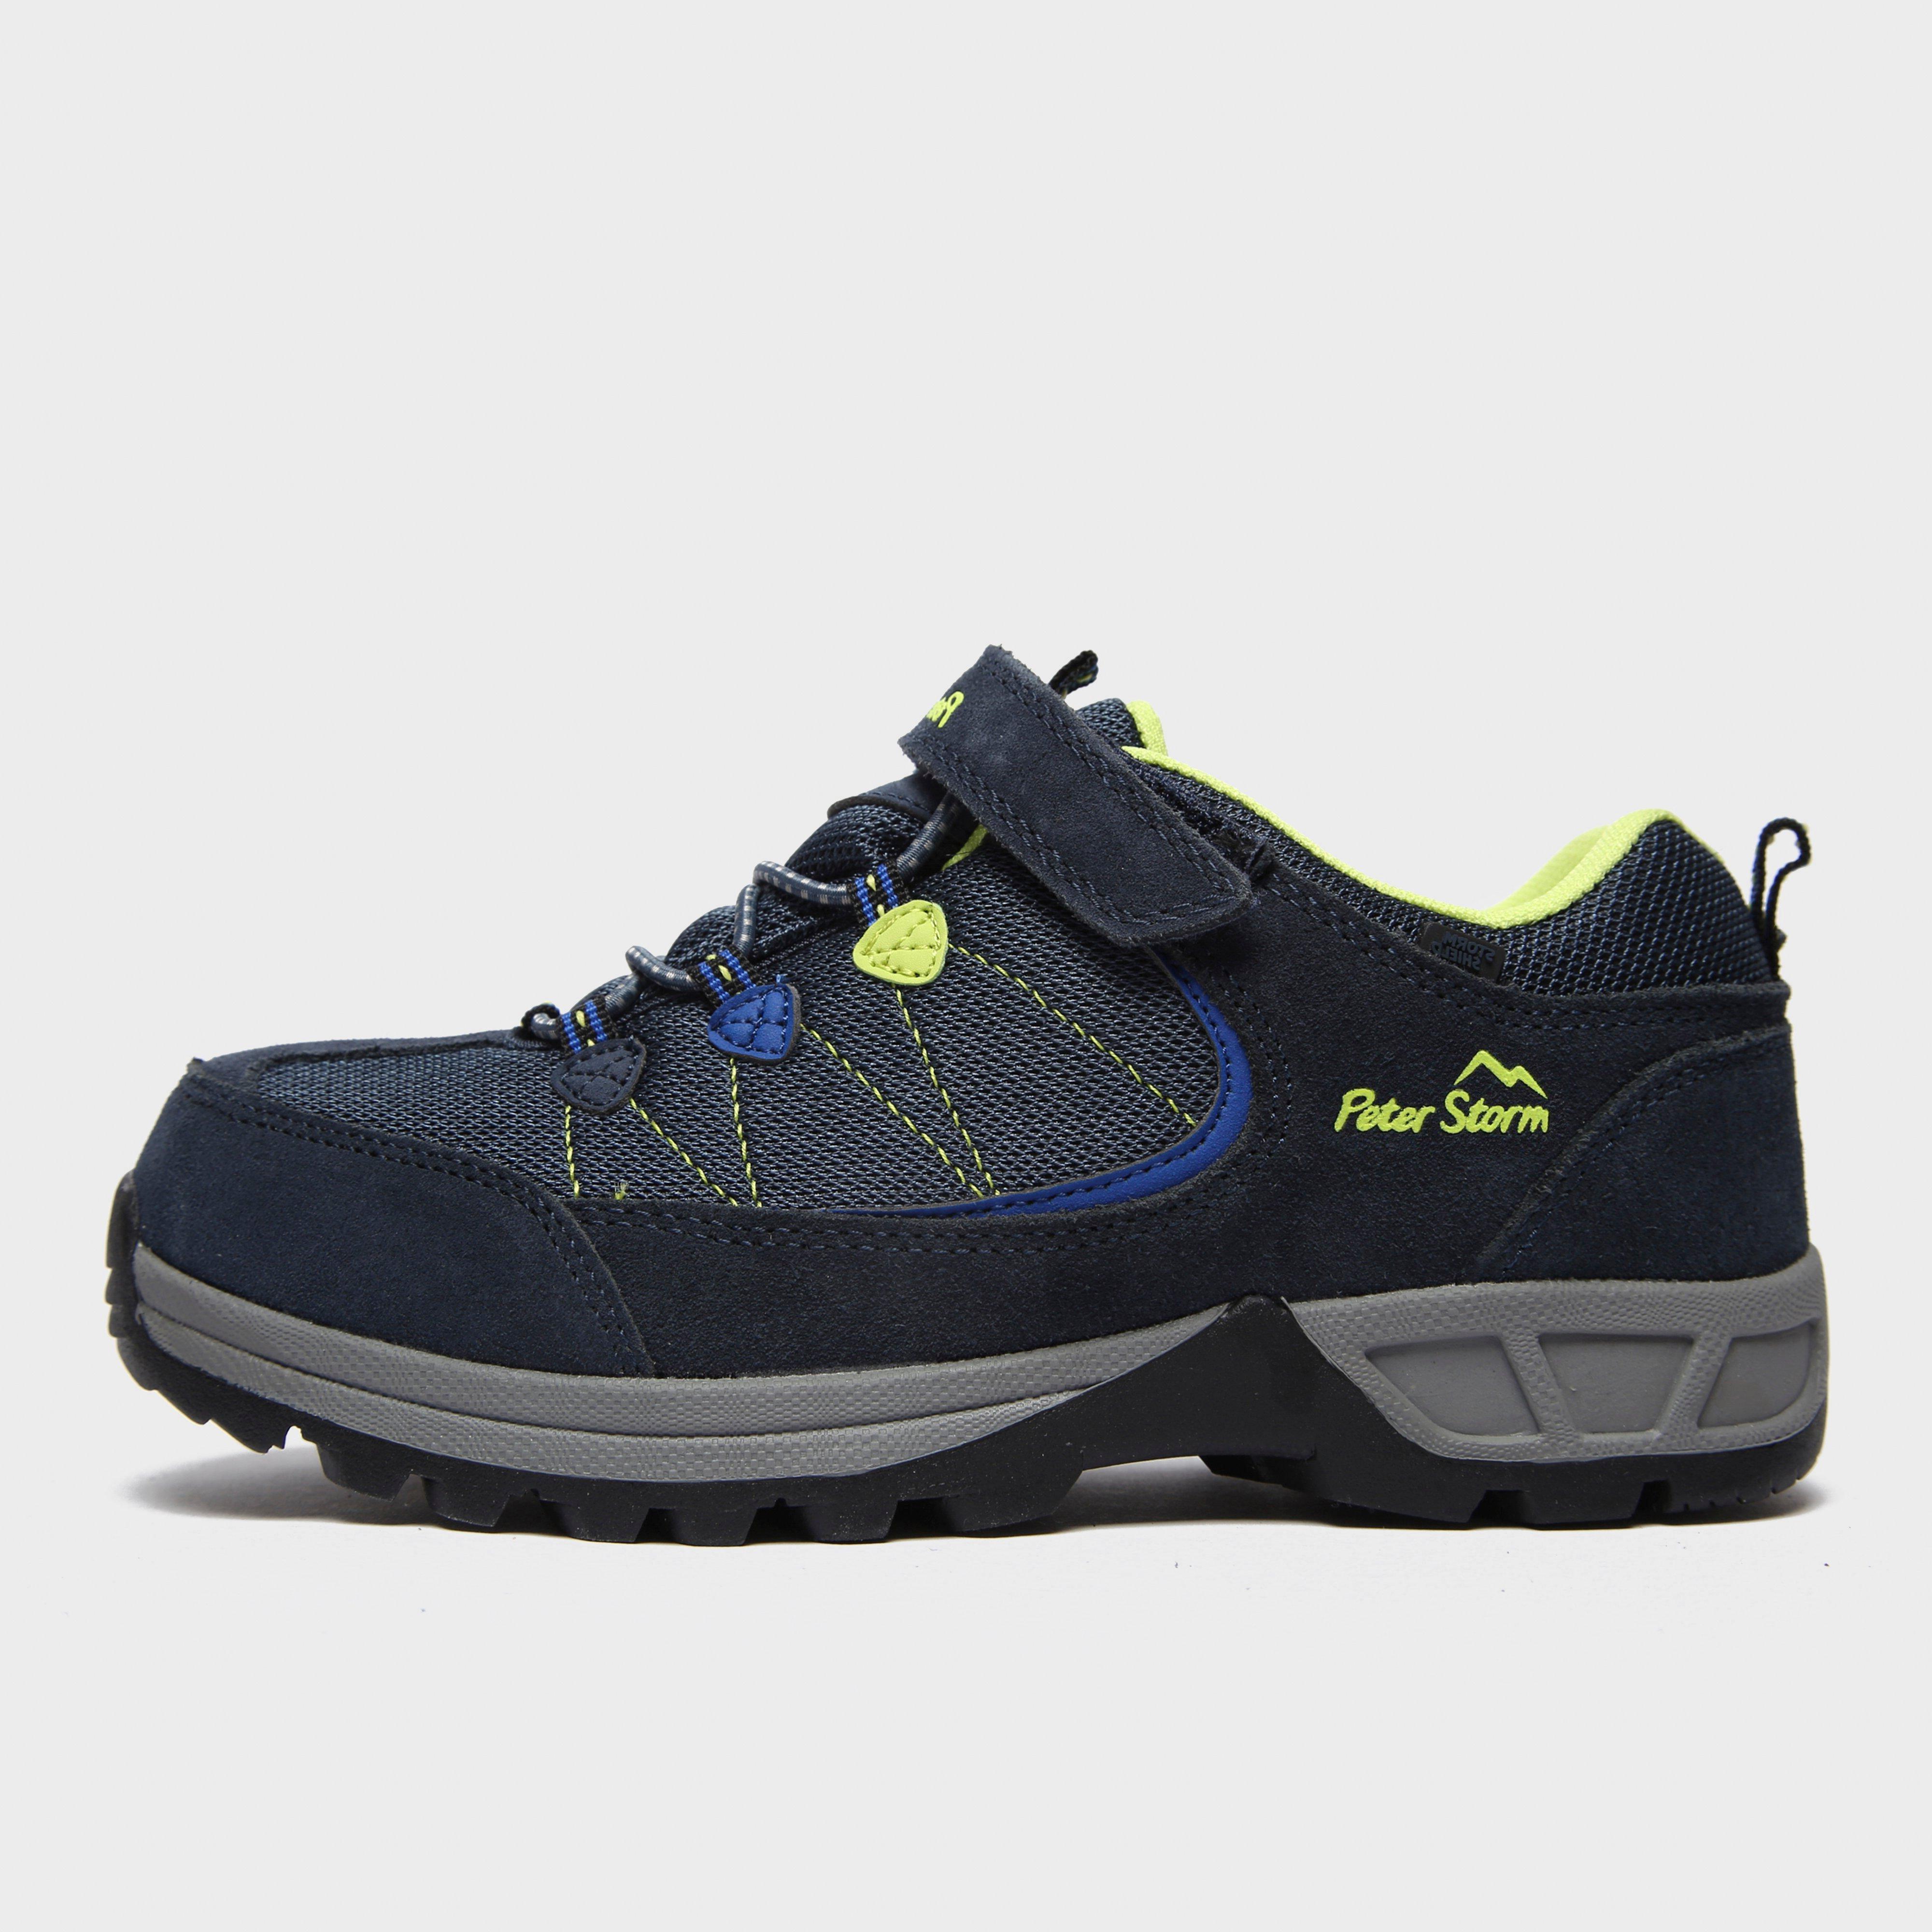 Peter Storm Kids' Harwood Ii Low Hiking Shoes - Blue/Dbl, Blue/Dark Blue